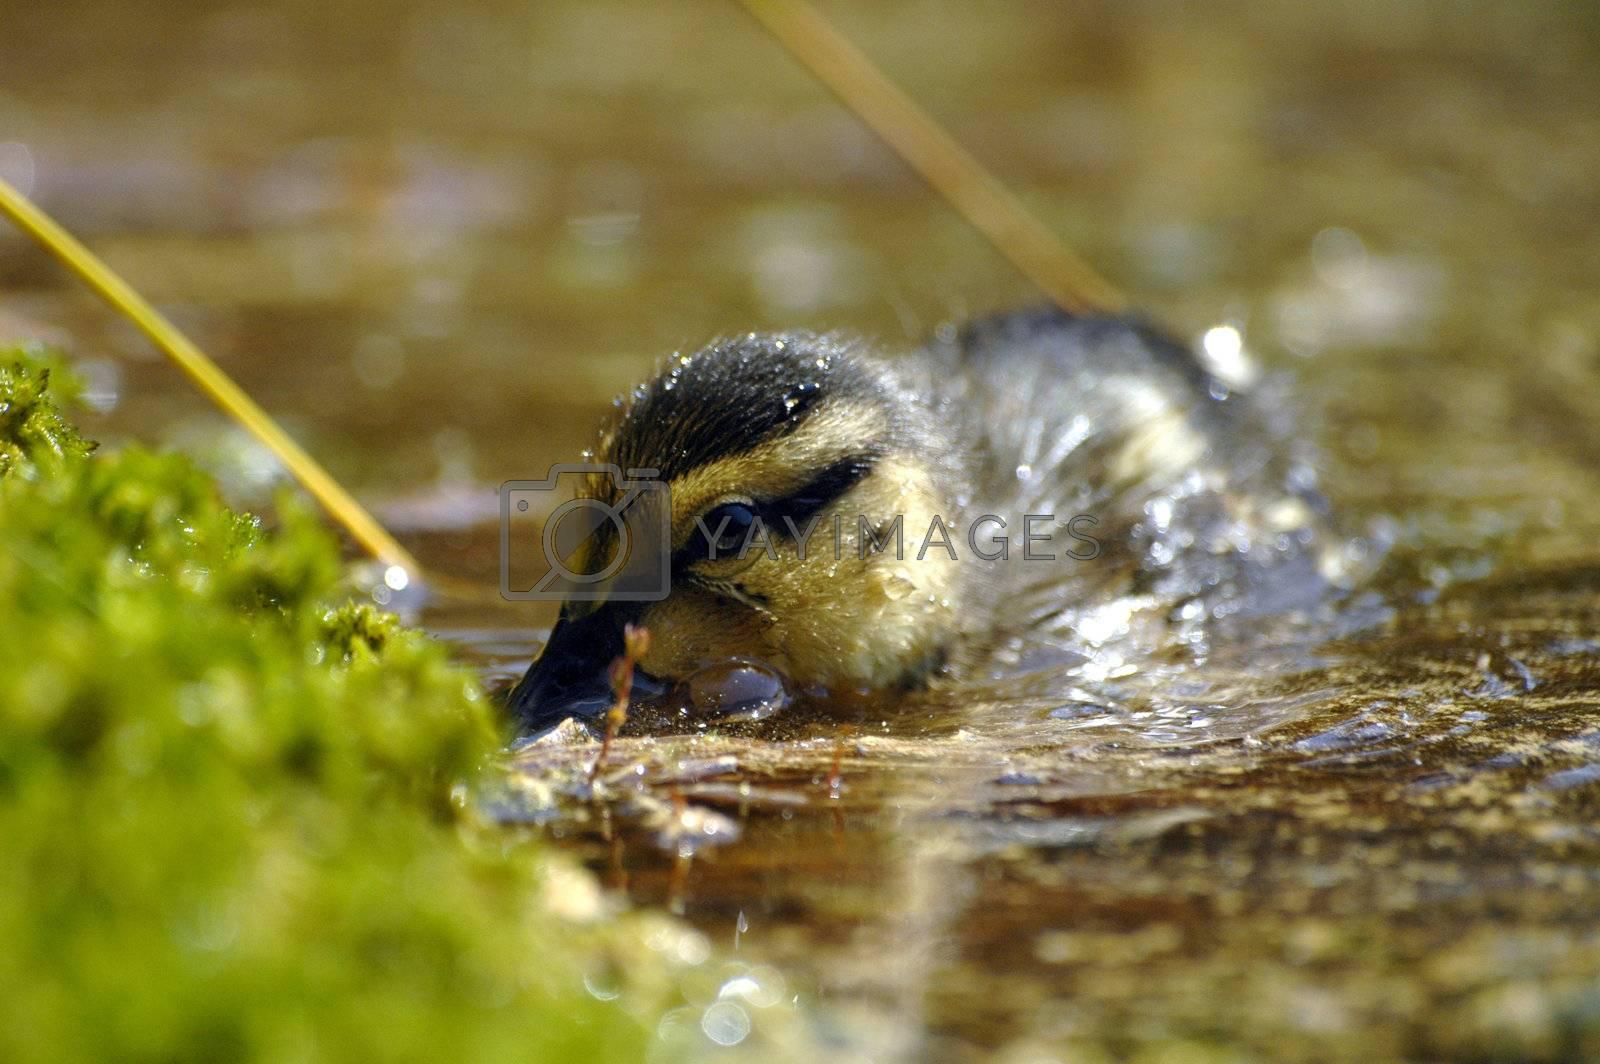 feeding duckling at the lake, horizontally framed shot